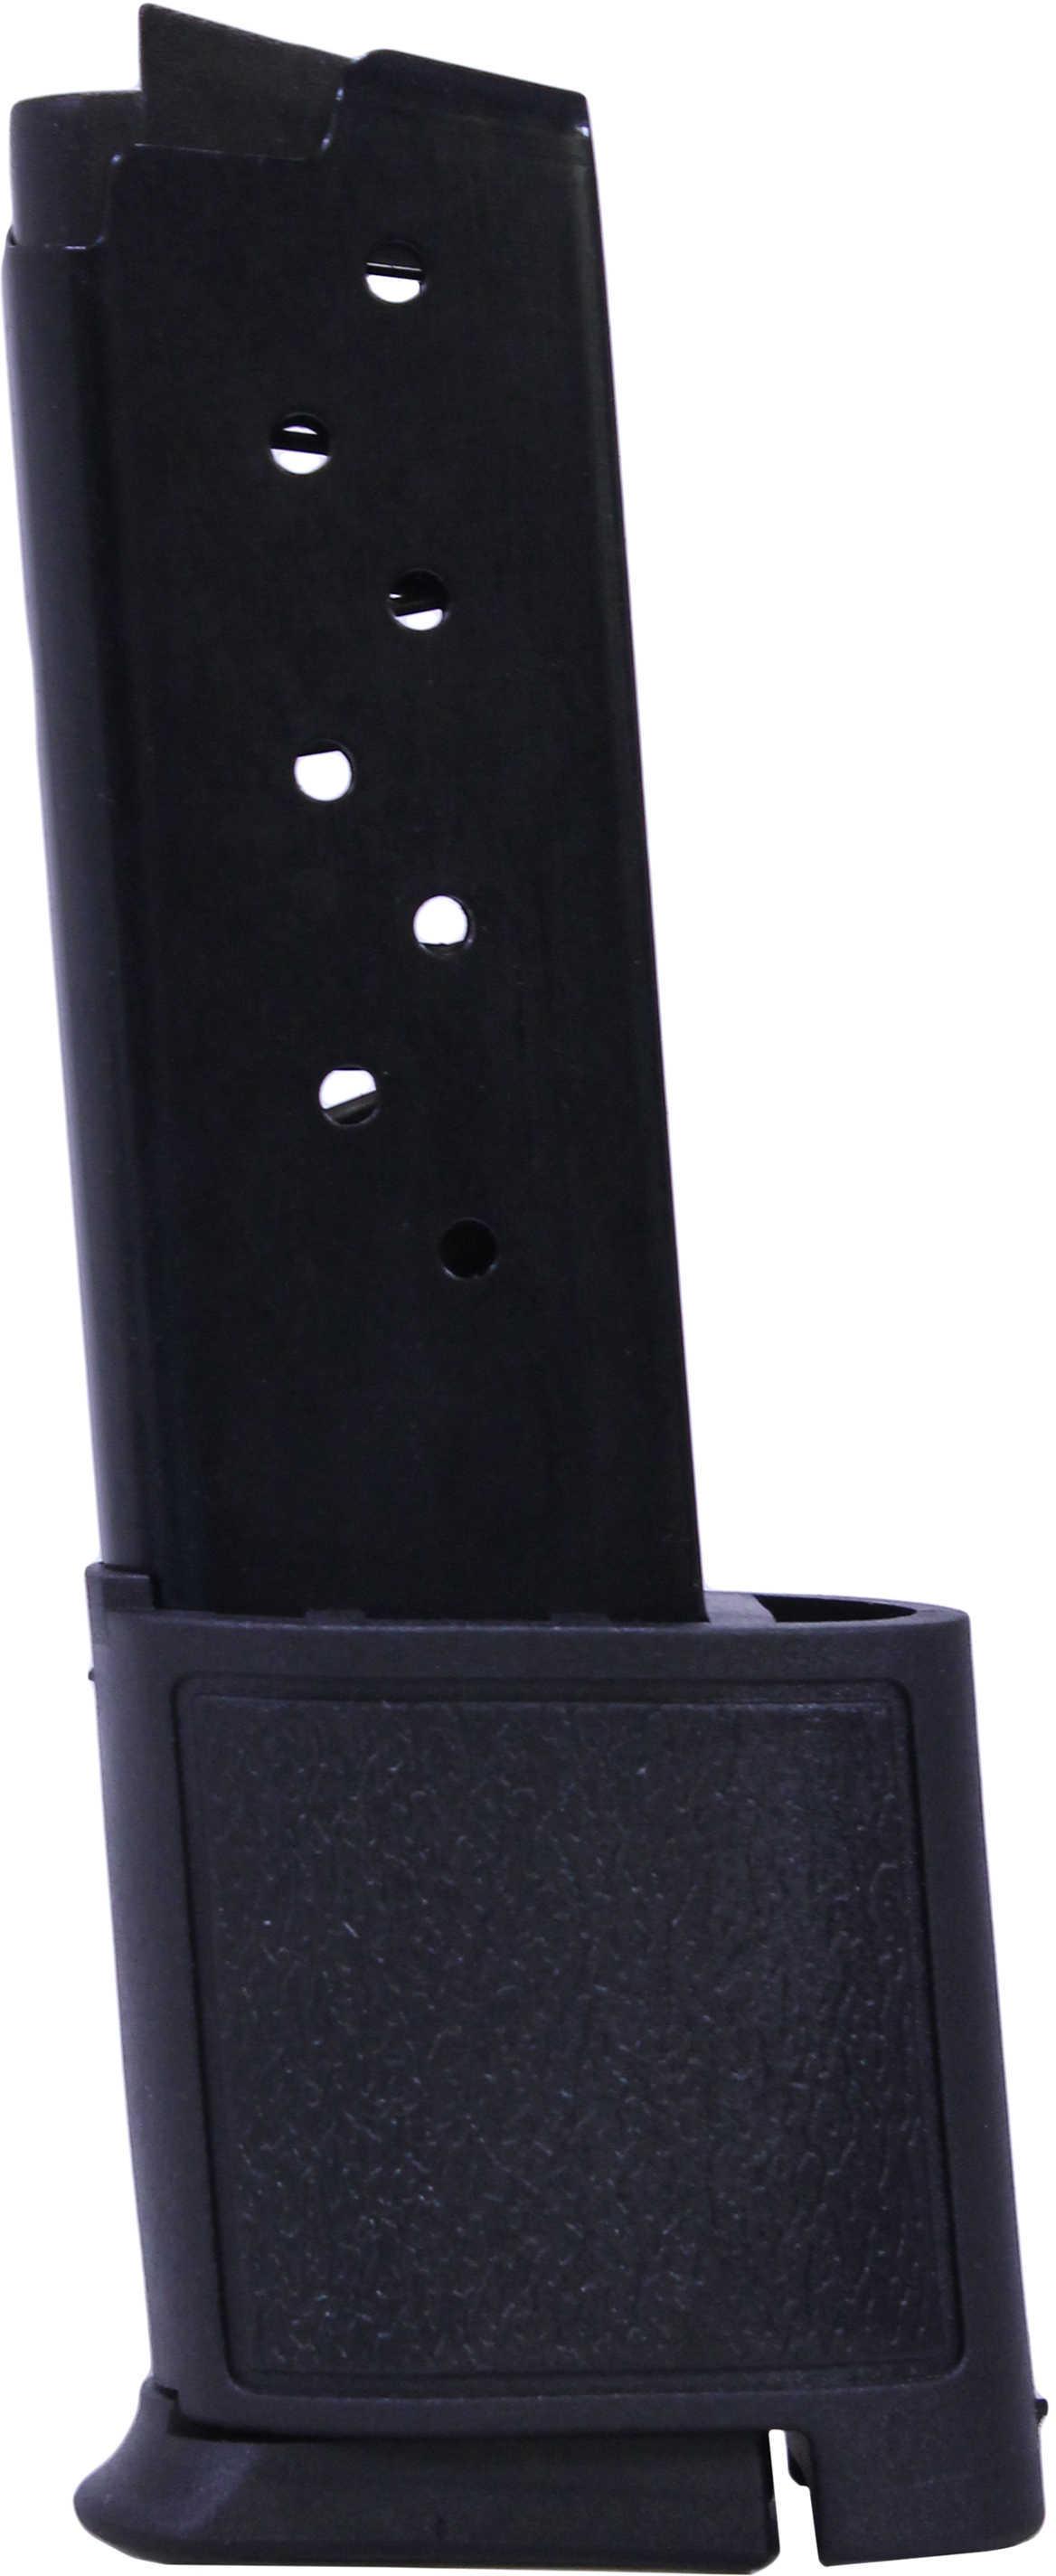 ProMag Sig Sauer P938 9mm 10 Round Capacity Magazine, Blue Steel Md: SIG 21